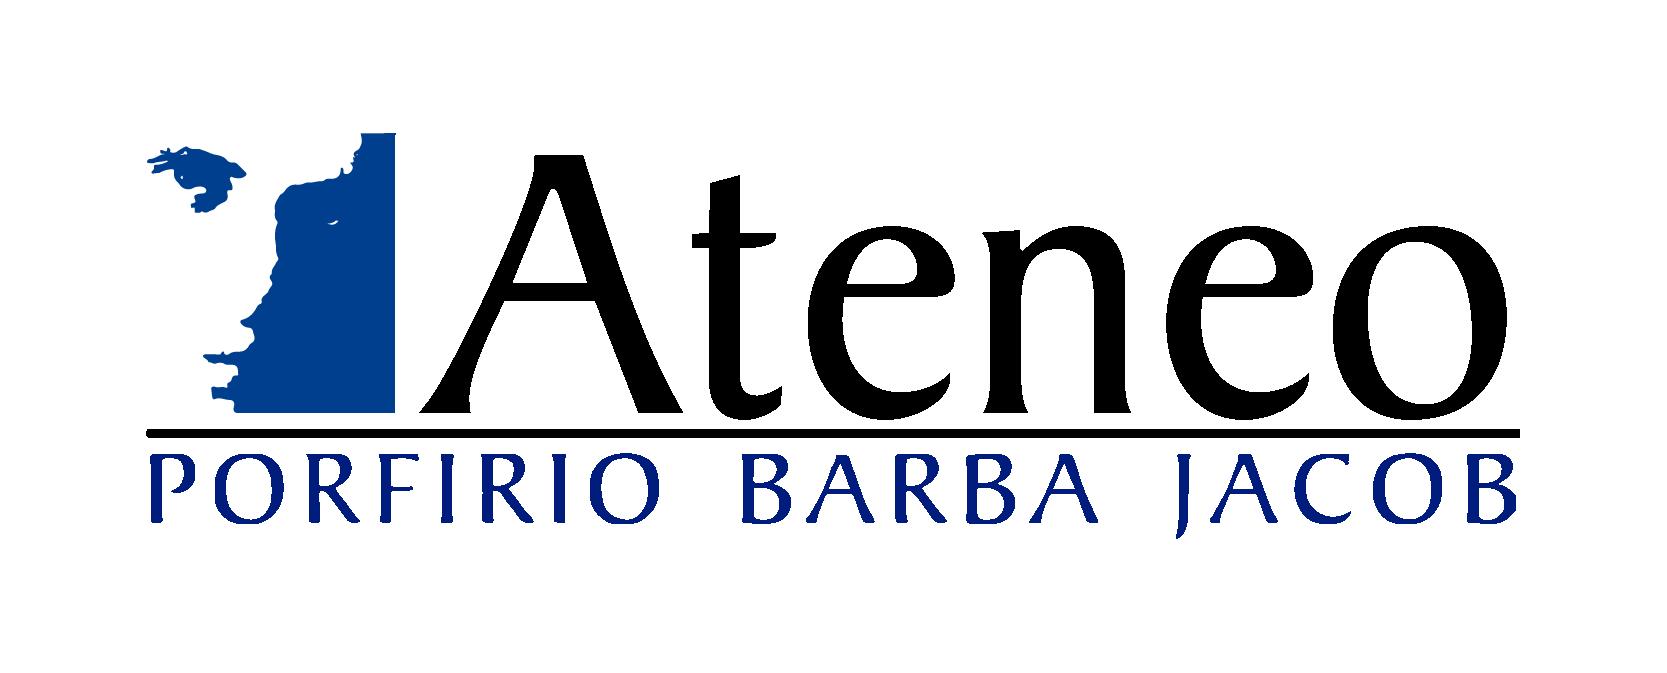 Corporación Ateneo Porfirio Barba Jacob Medellin